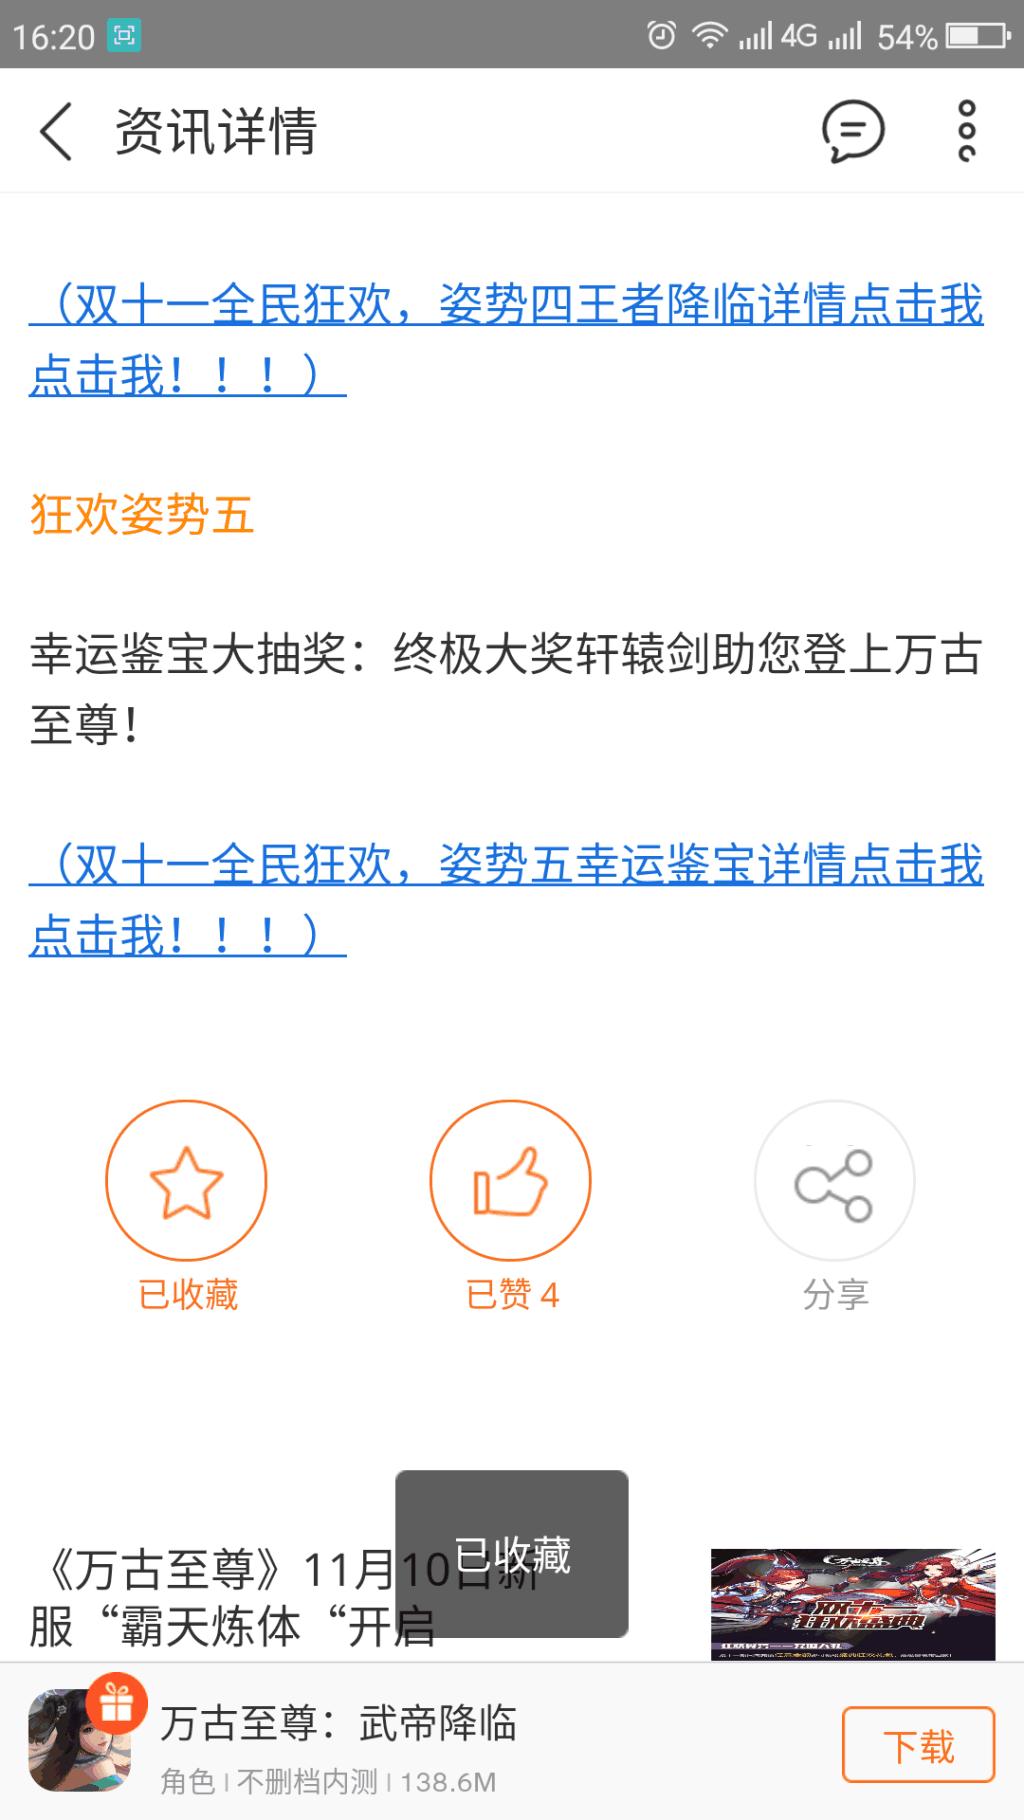 Screenshot_2018s11s11s16s20s16.png